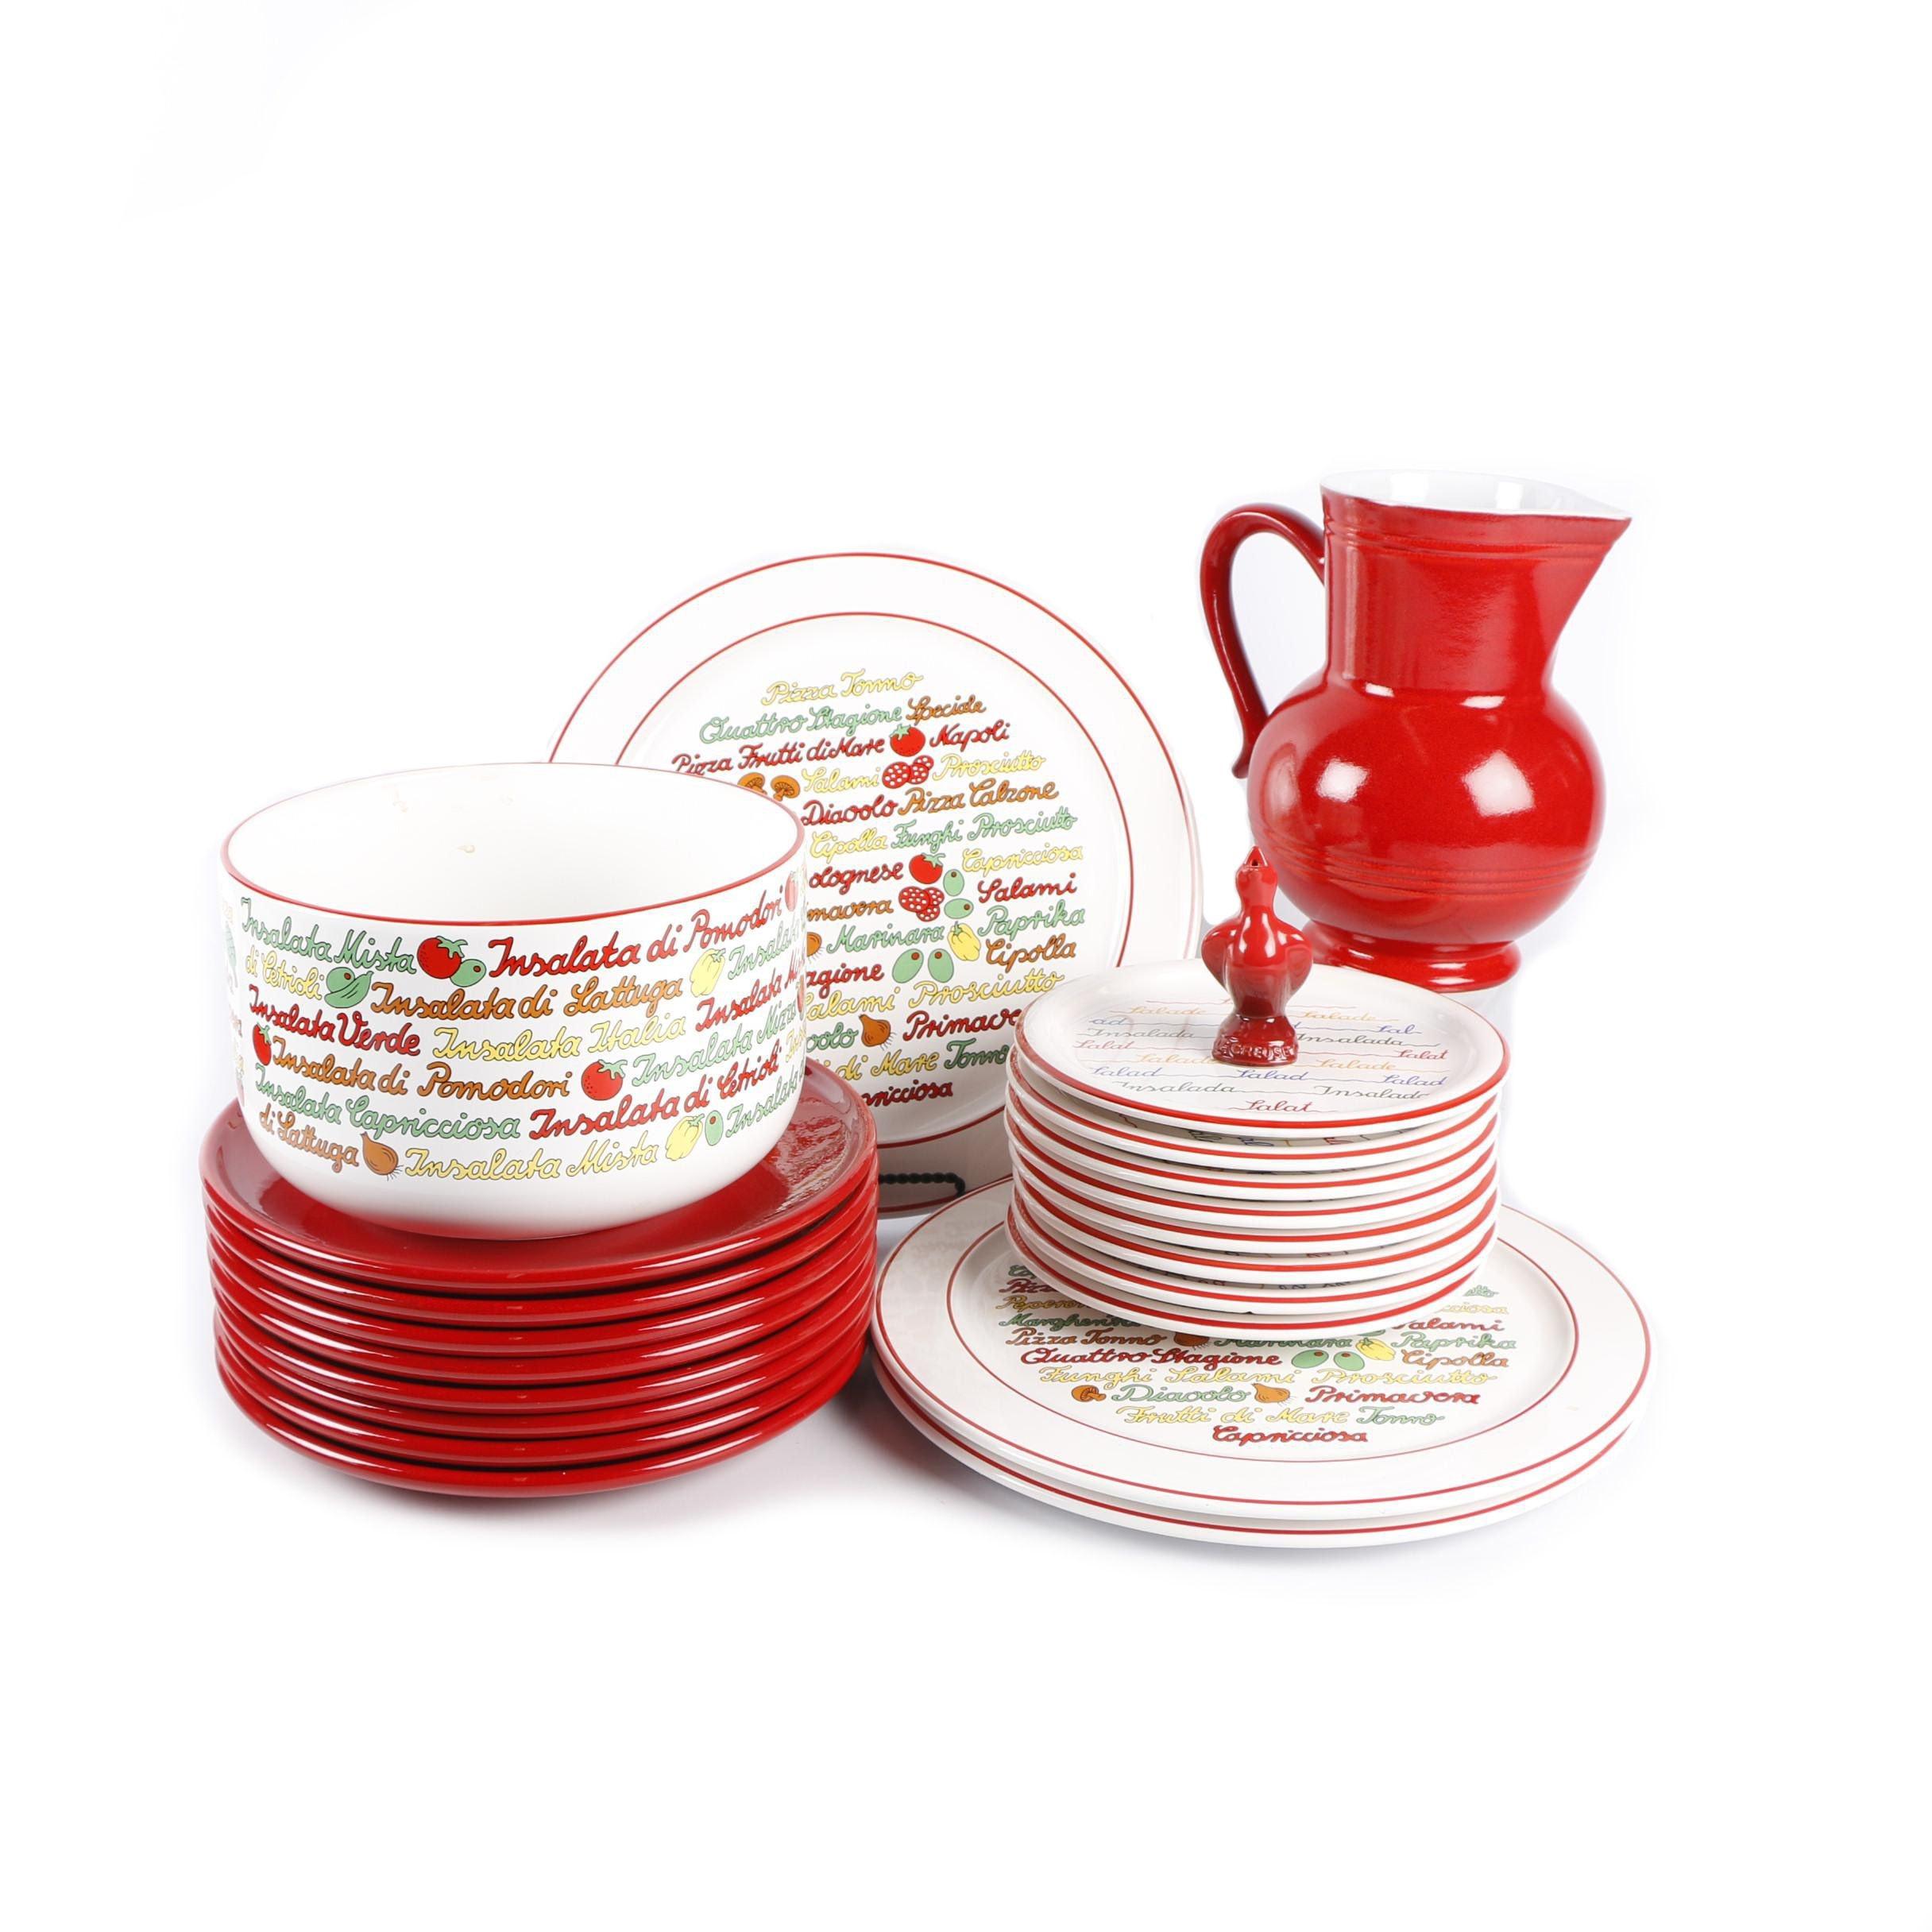 Waechtersbach Tableware, Emile Henry Pitcher and Le Creuset Pie Bird